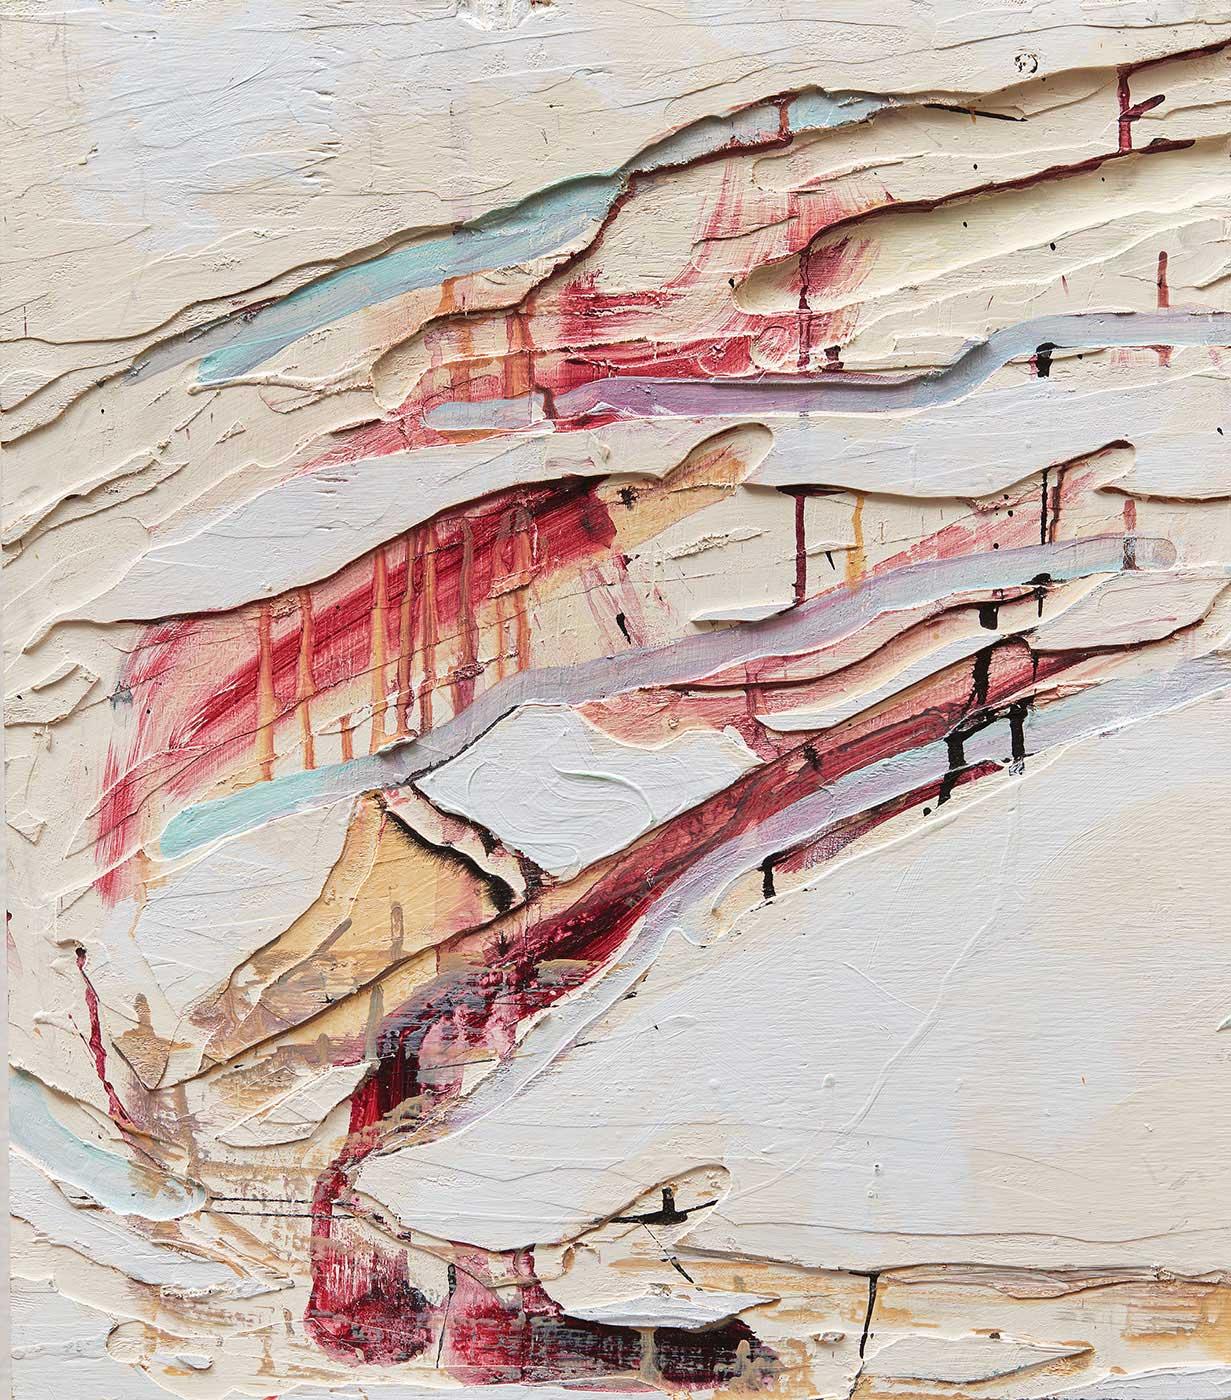 Gabrielle E. Leighton - How Deep